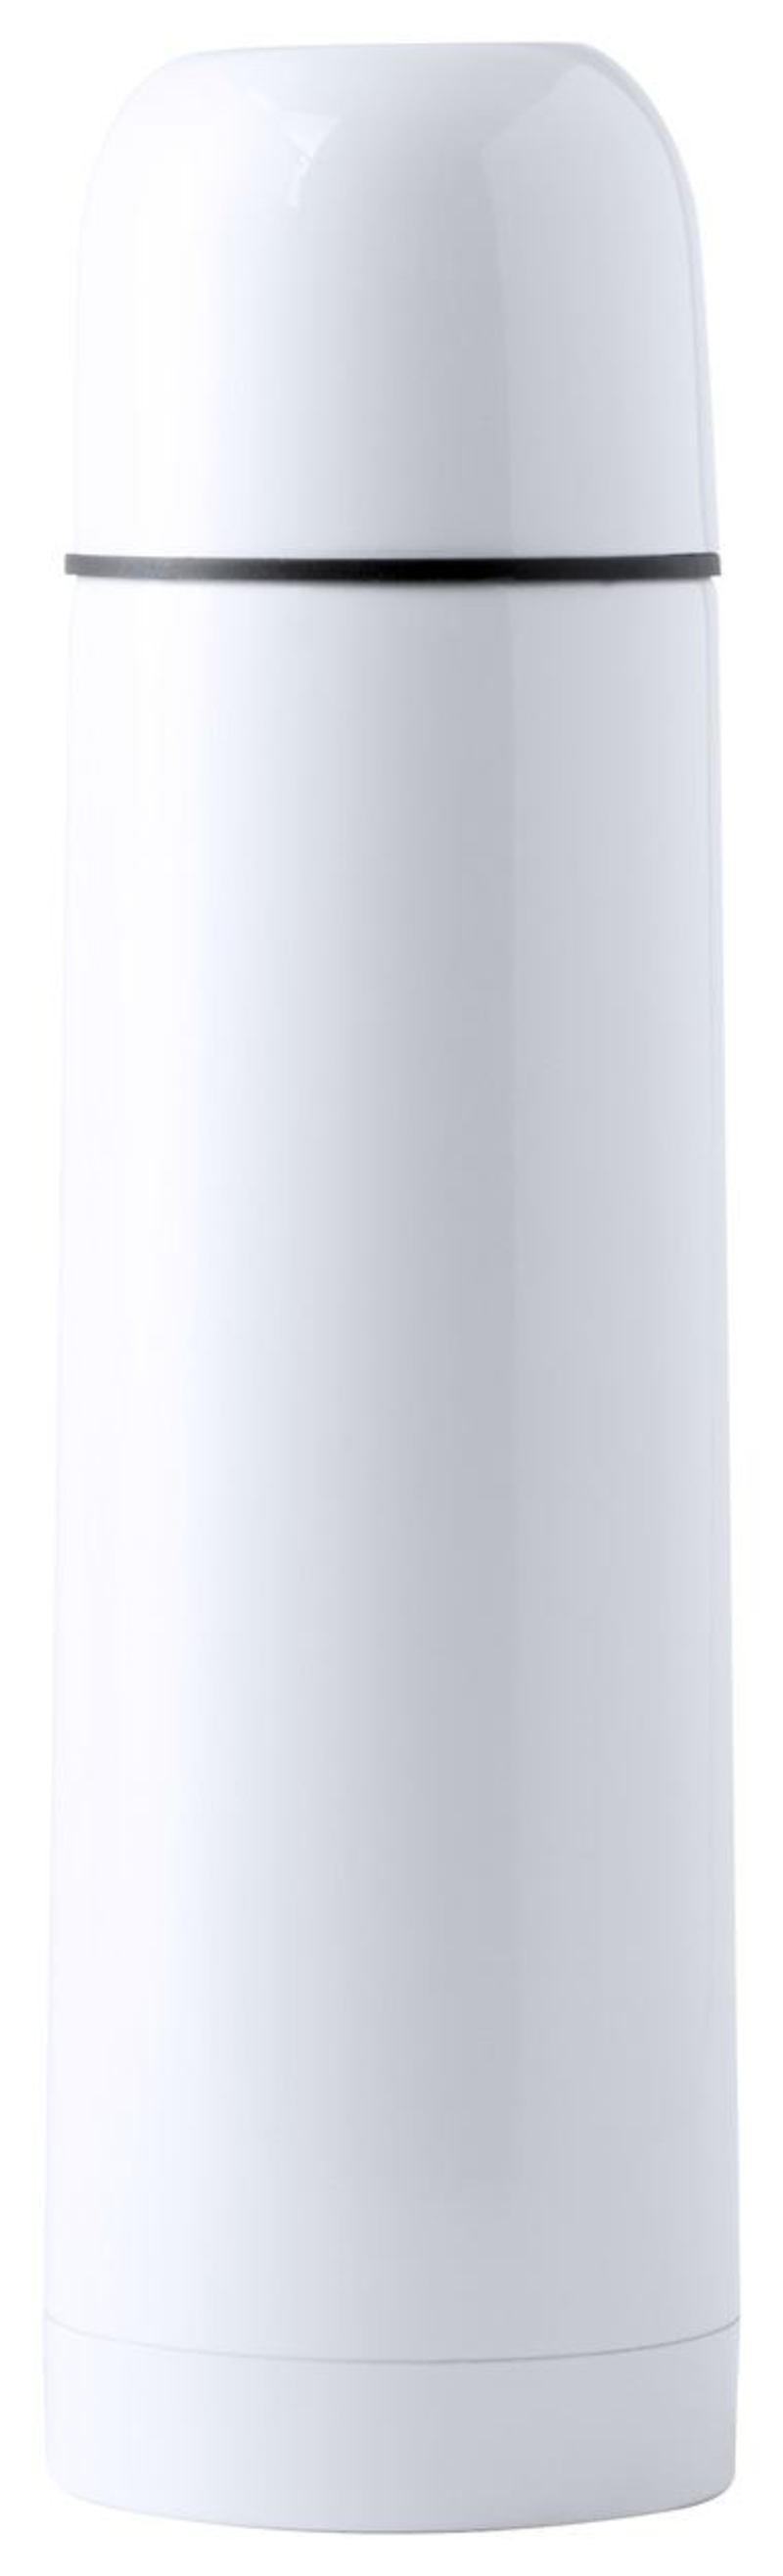 Cleikon vacuum flask